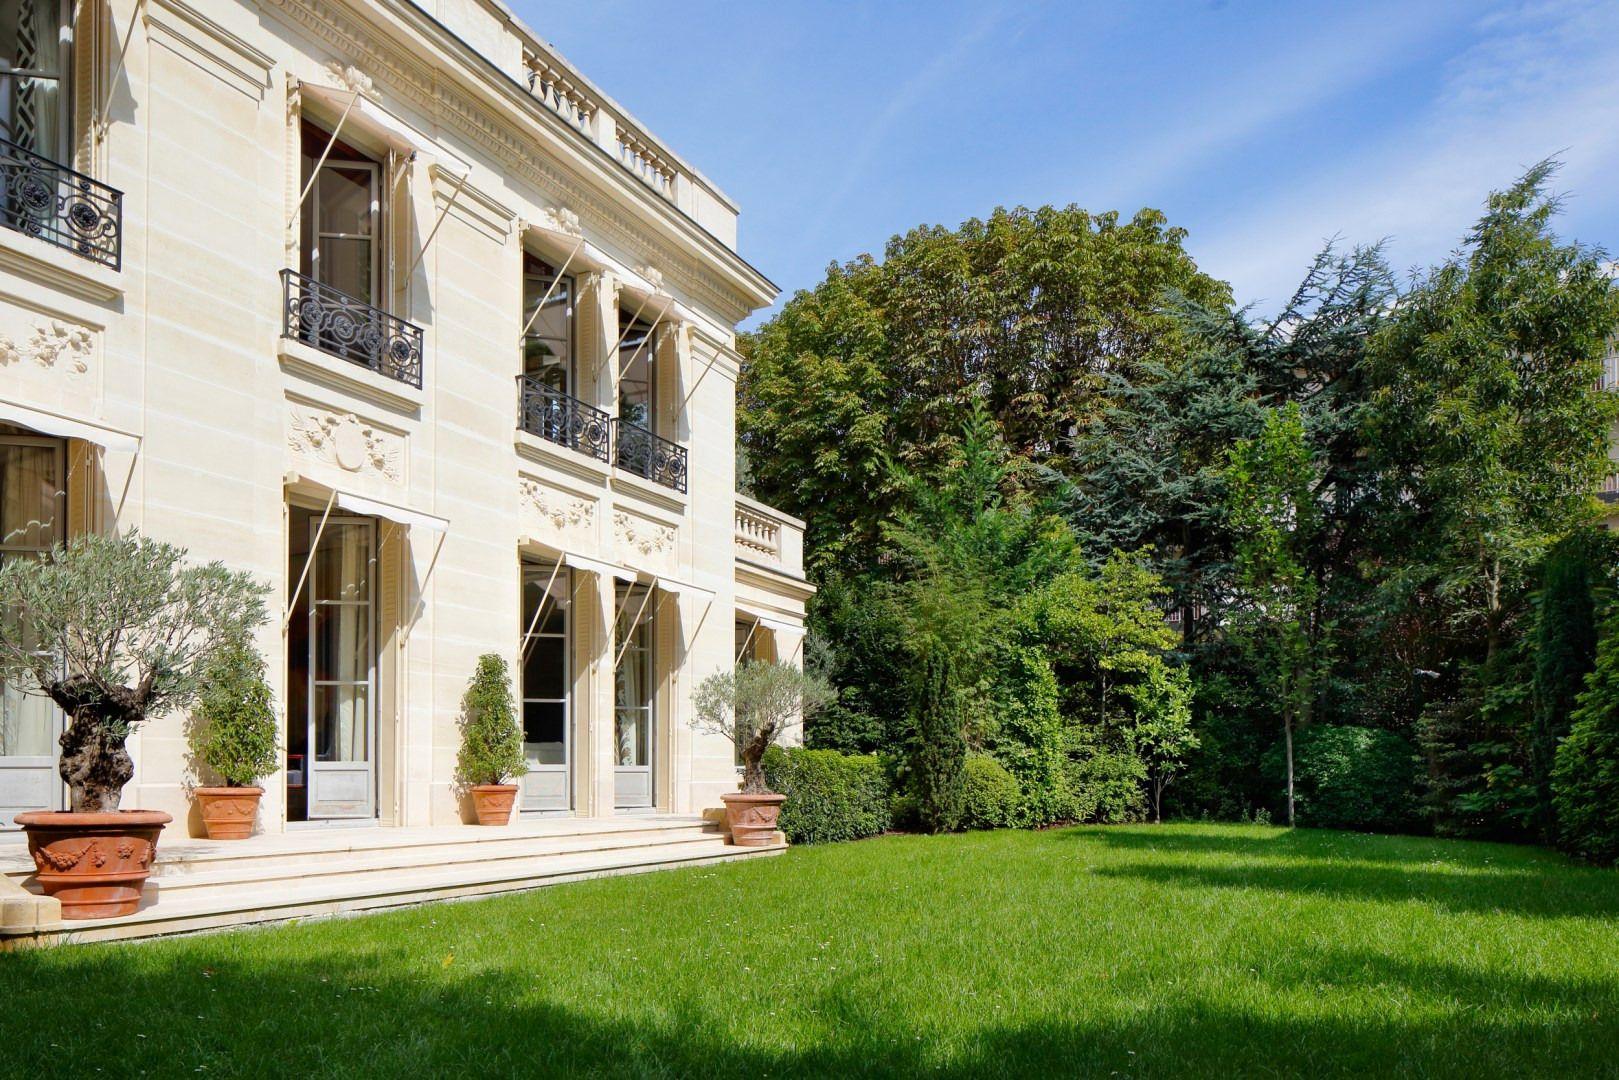 Sale Private Mansion 1294 M 20 Rooms Paris 16ème Neuilly Sur Seine Luxury Property International Real Estate